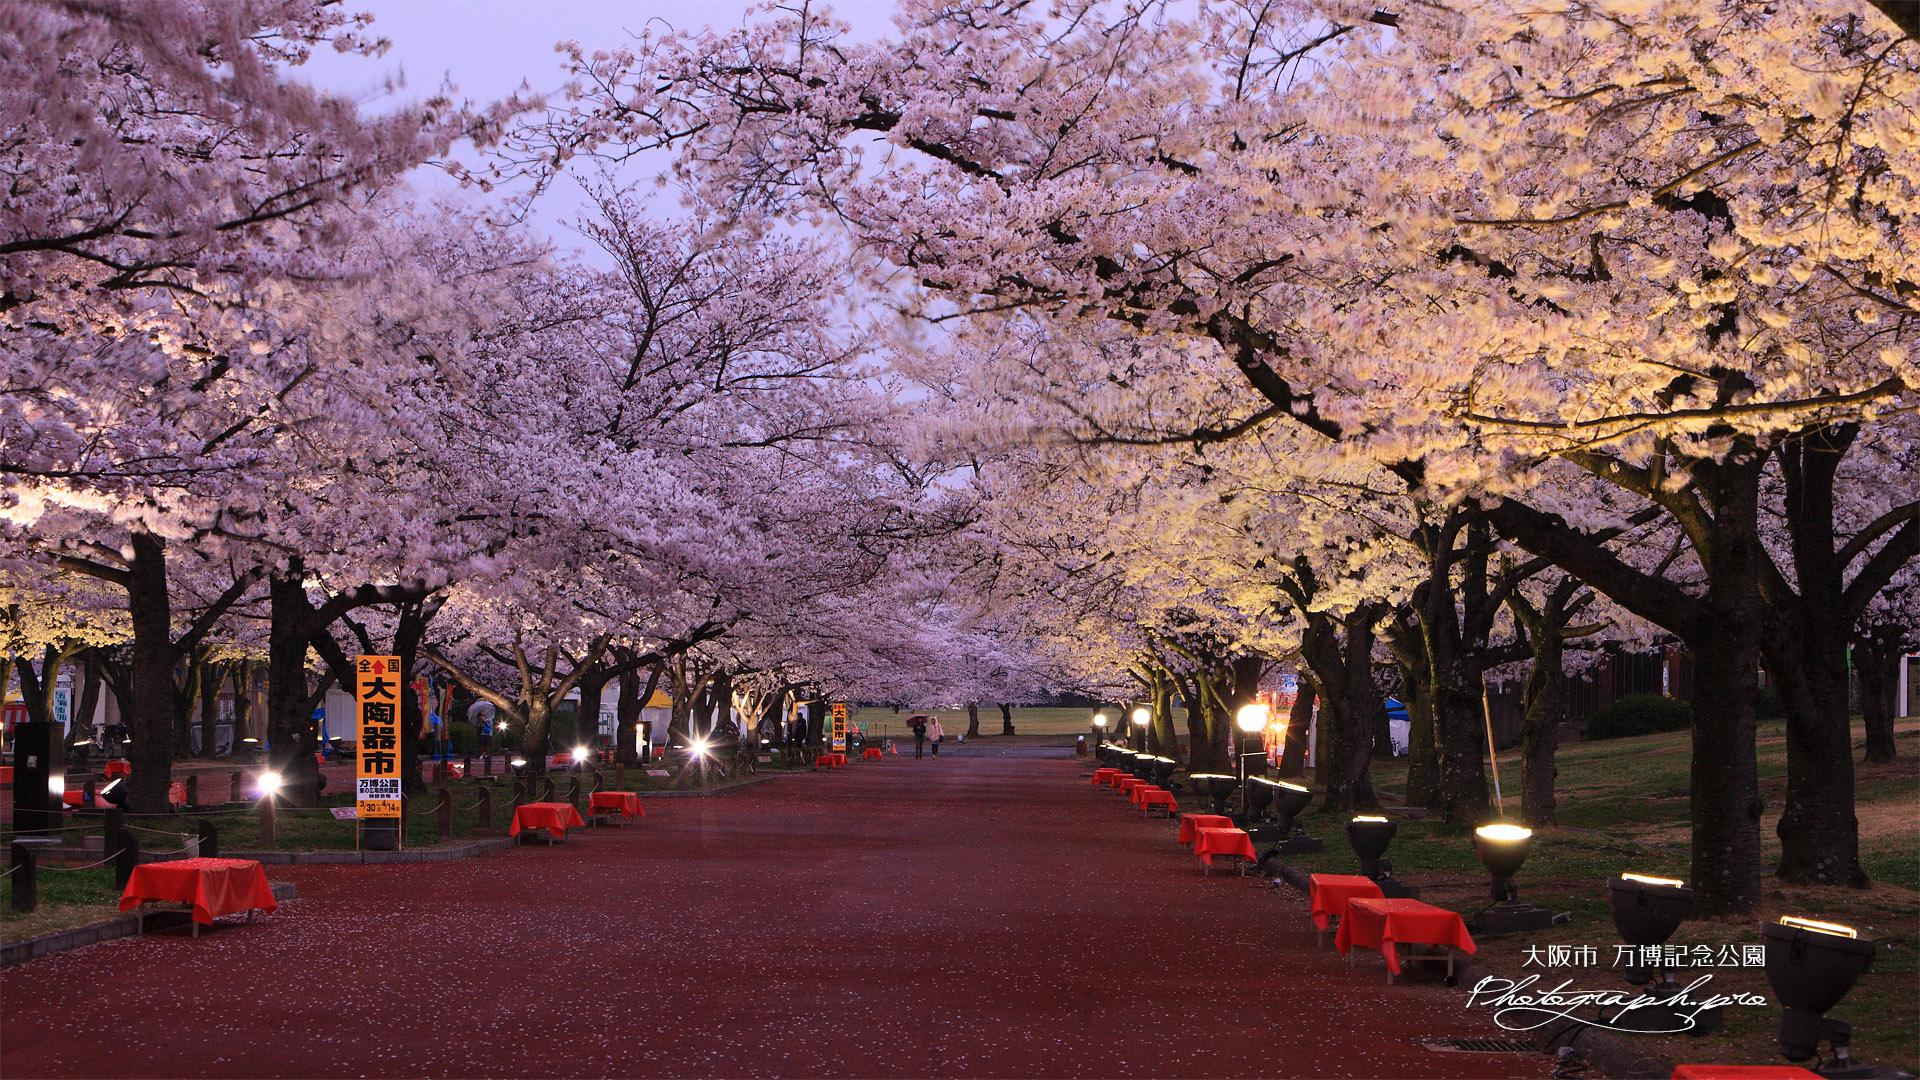 万博記念公園の桜 東大路桜並木 の壁紙 19x1080